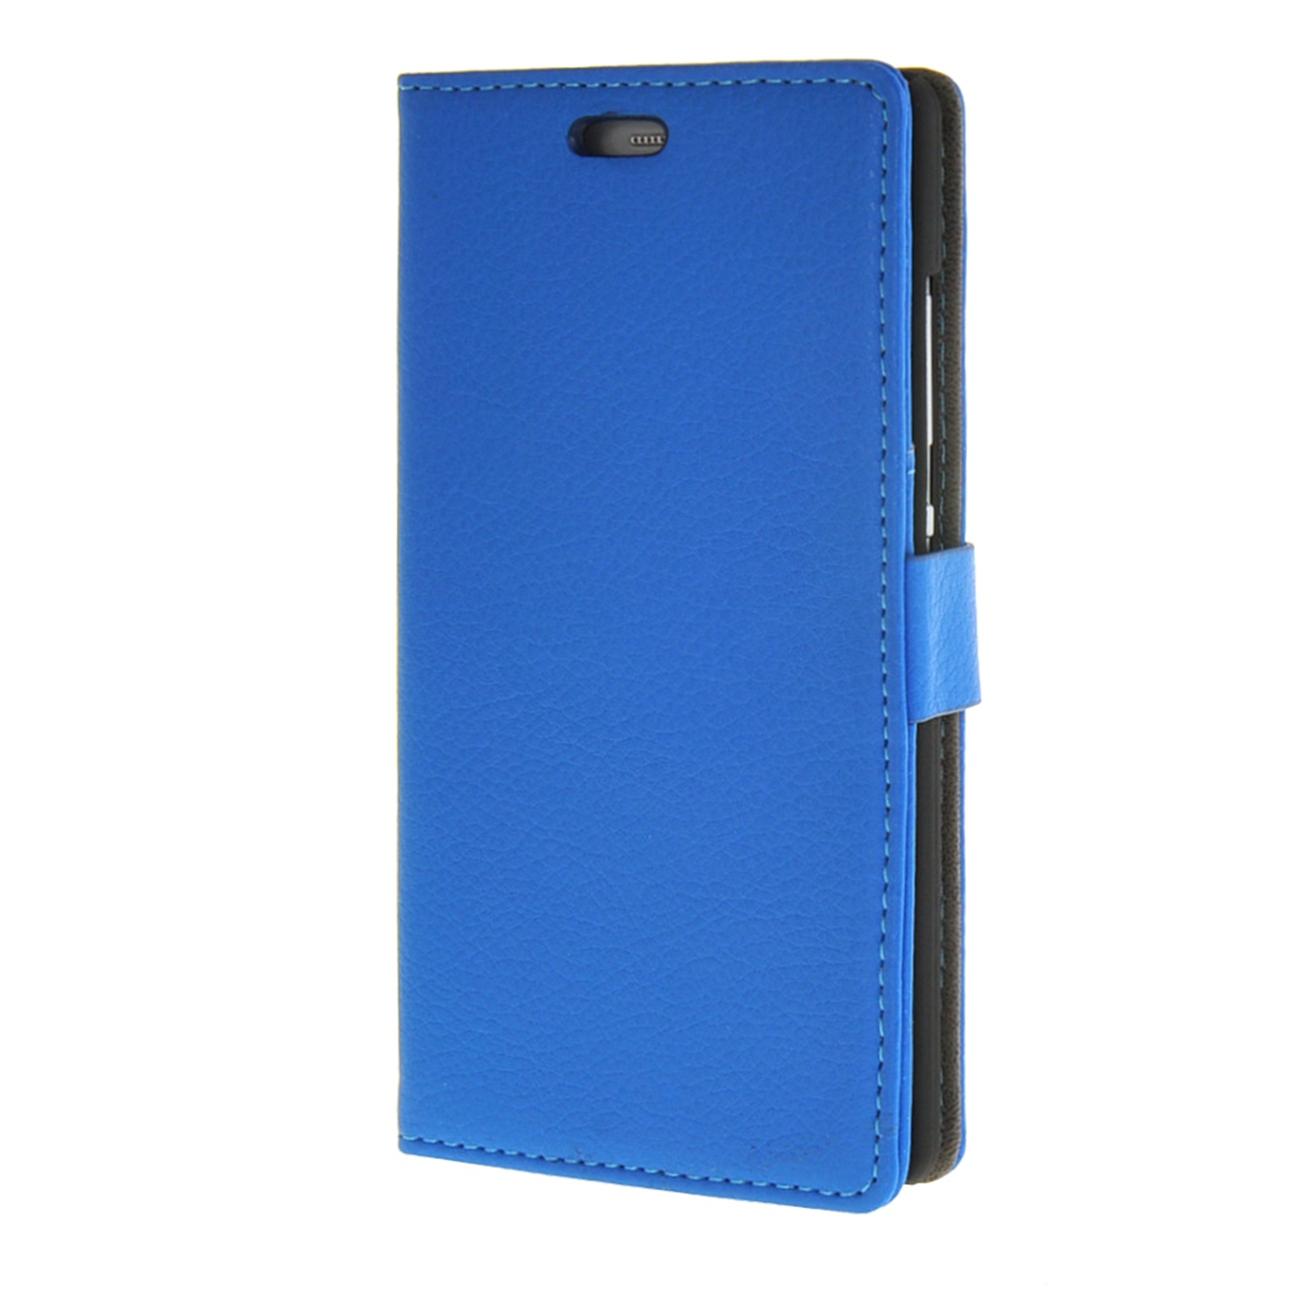 MOONCASE mooncase litch skin leather card slot wallet bracket back чехол для huawei honor 4c blue